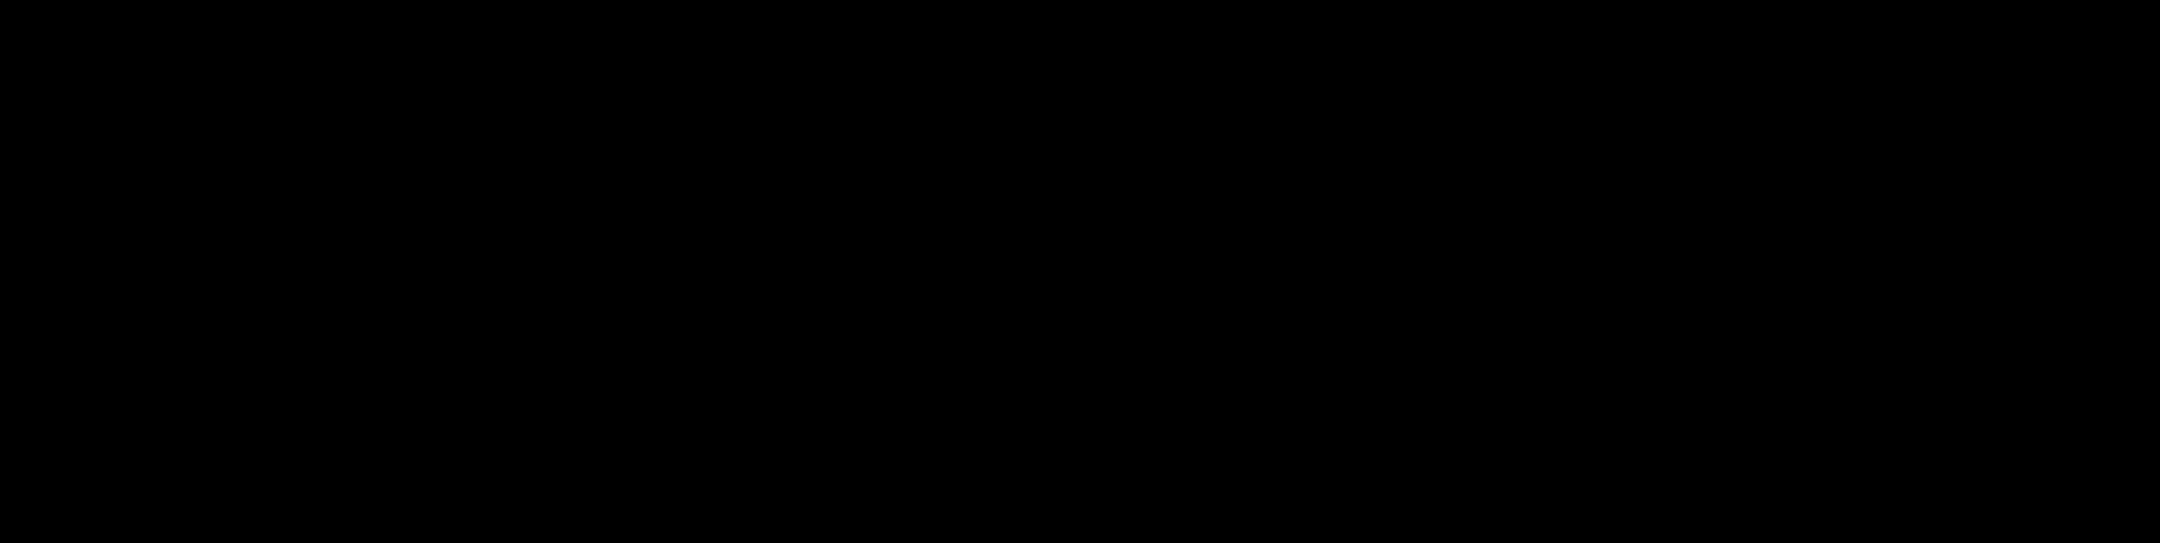 bodog logo 5 - Bodog Logo